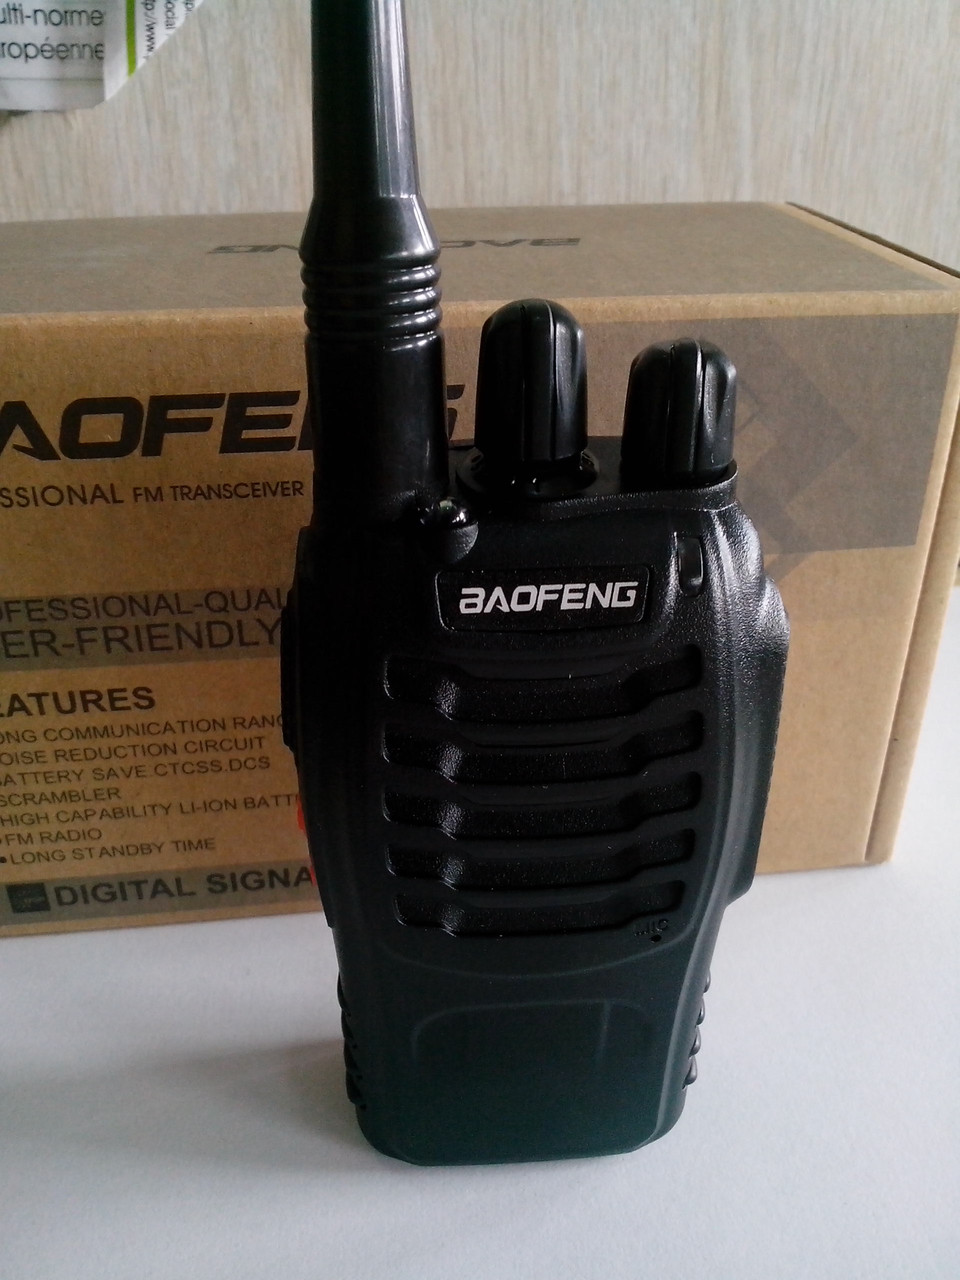 Радиостанция Baofeng BF-888s + усиленная антенна 771